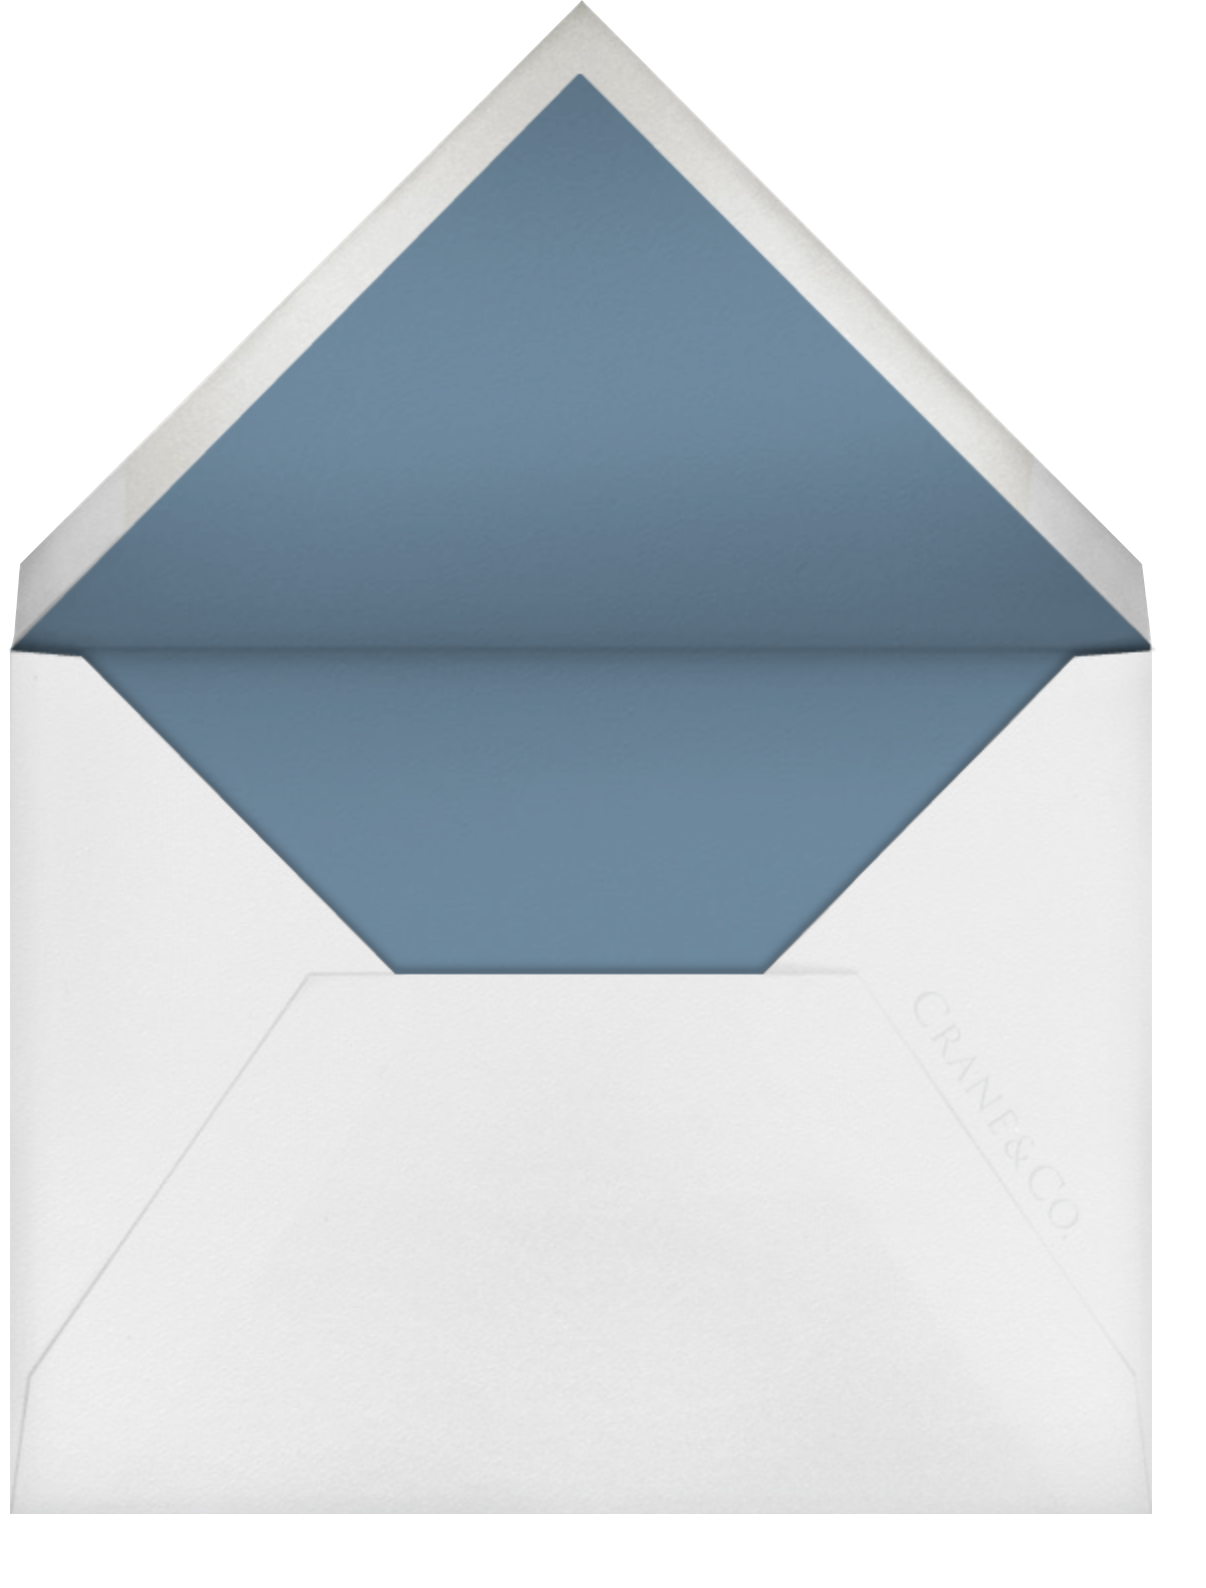 Amande - Newport Blue - Paperless Post - Birth - envelope back